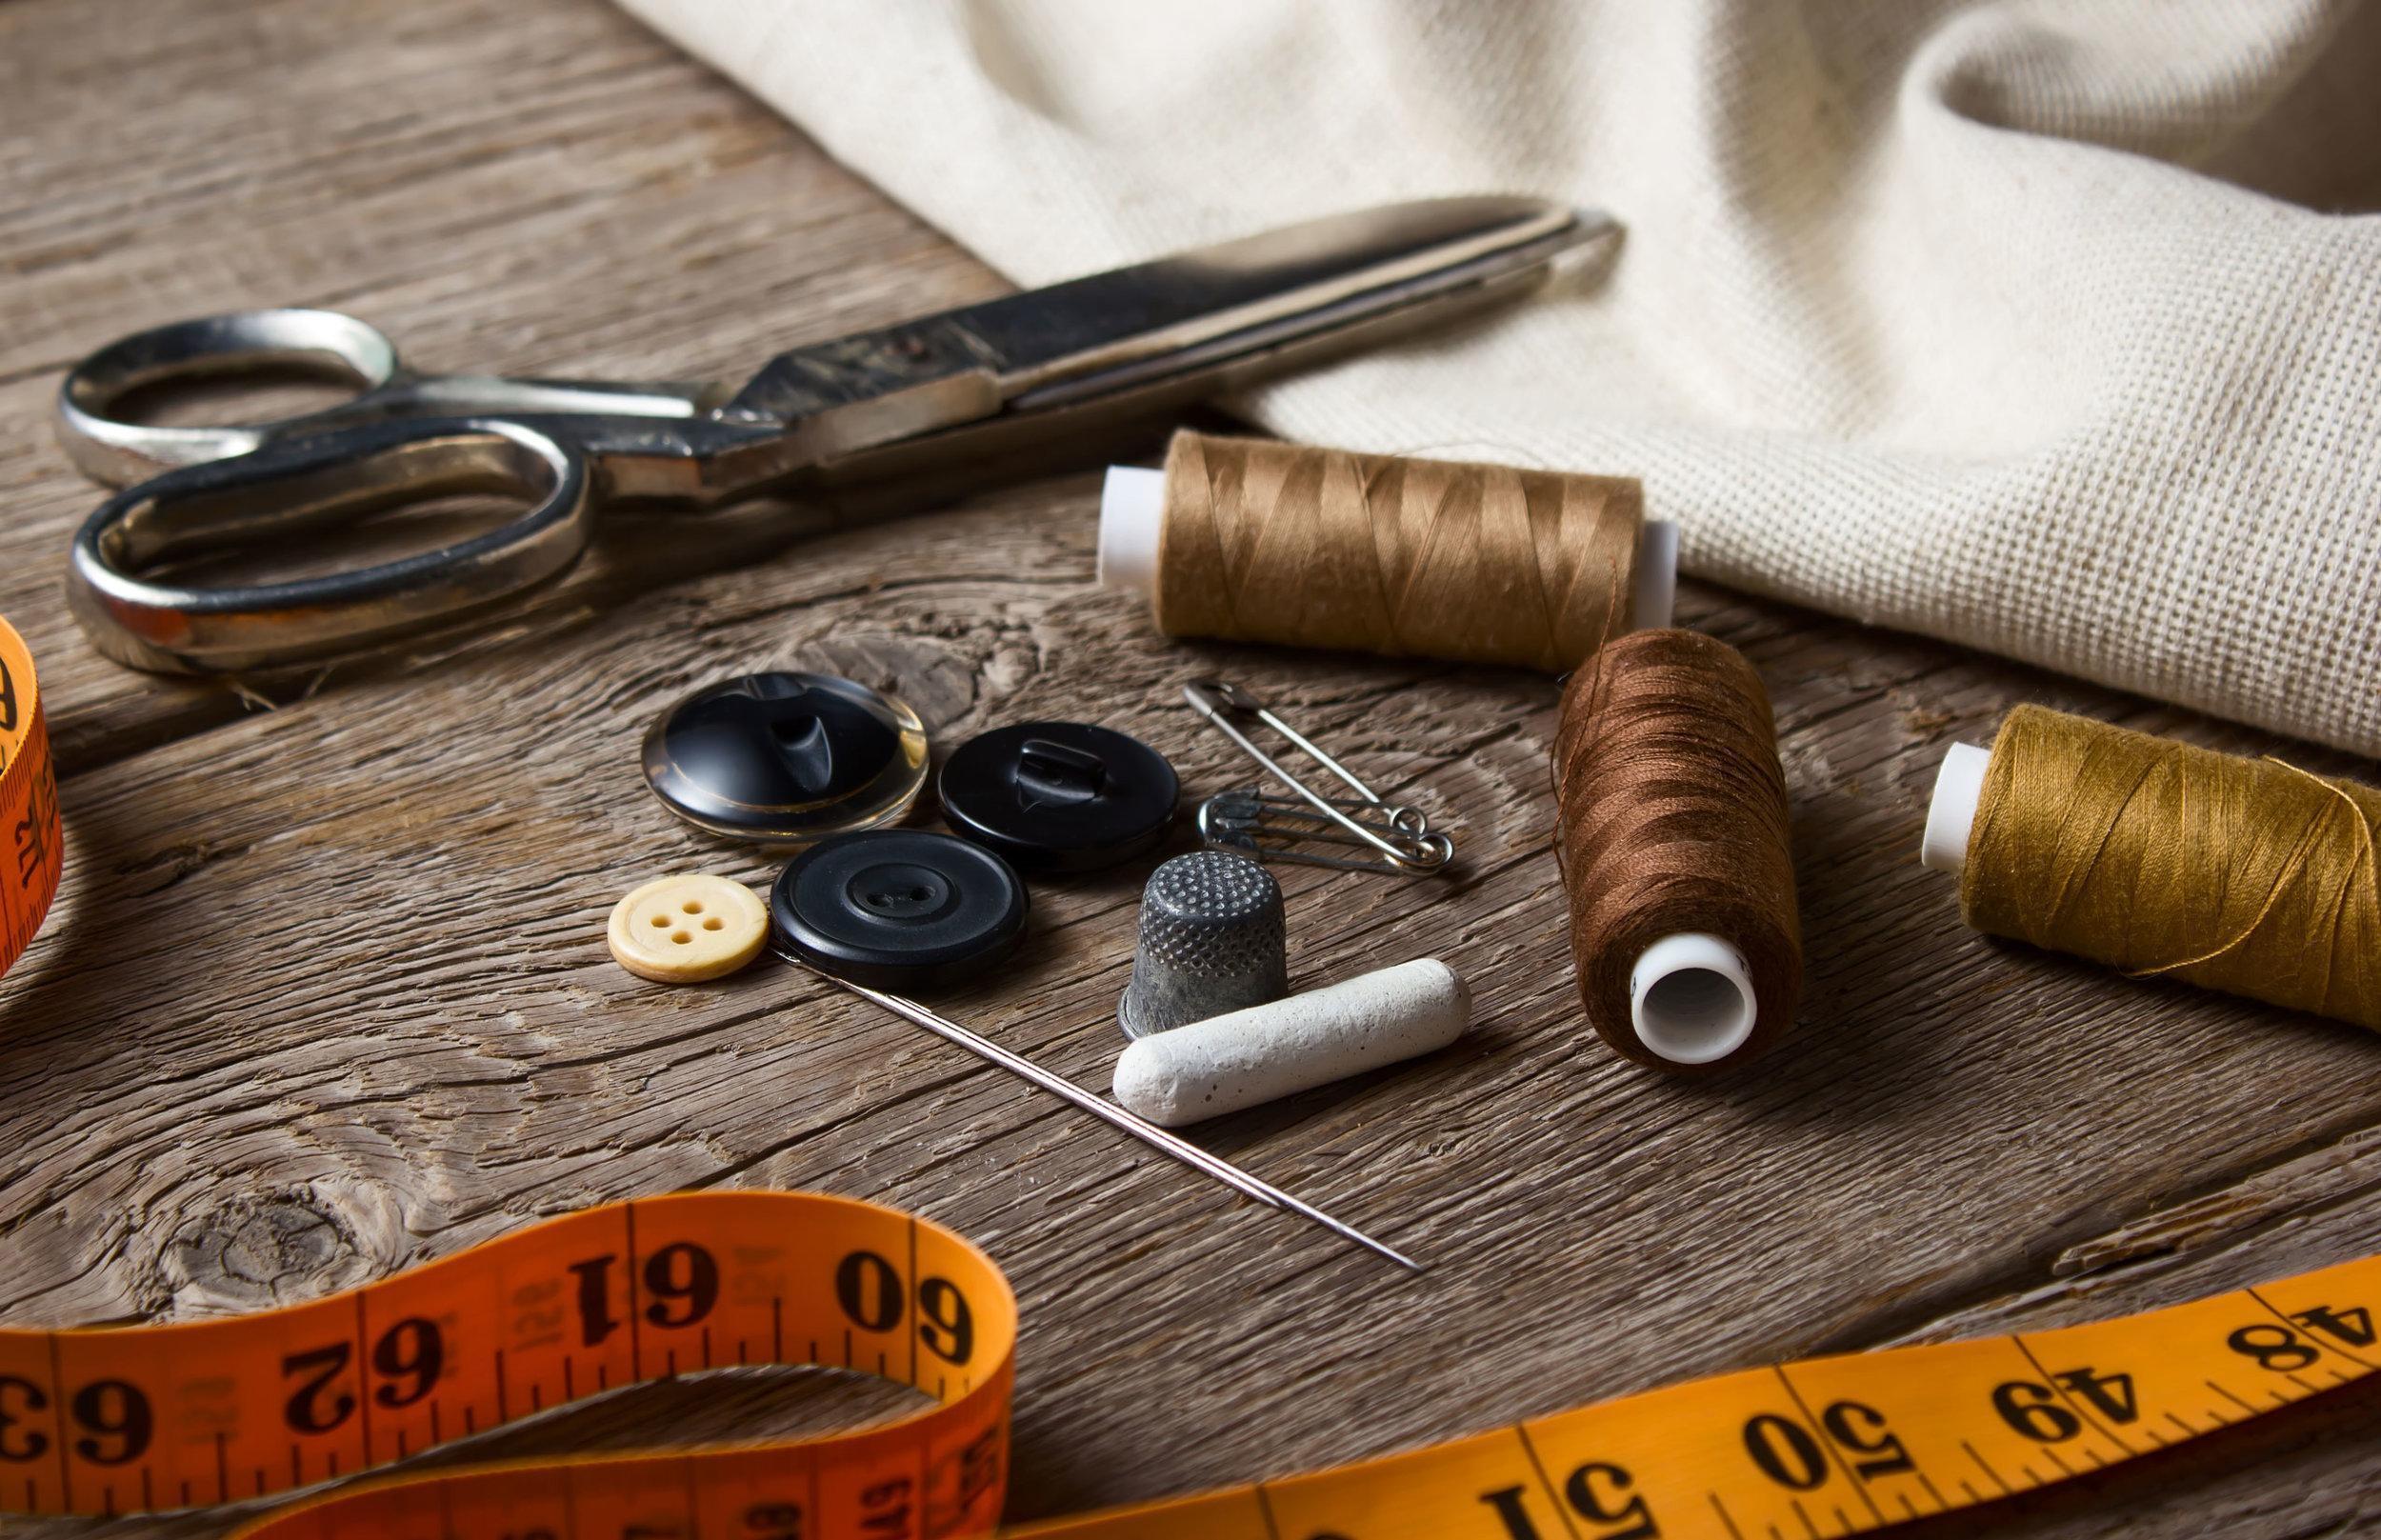 sewing-PF88BH5_sm.jpg